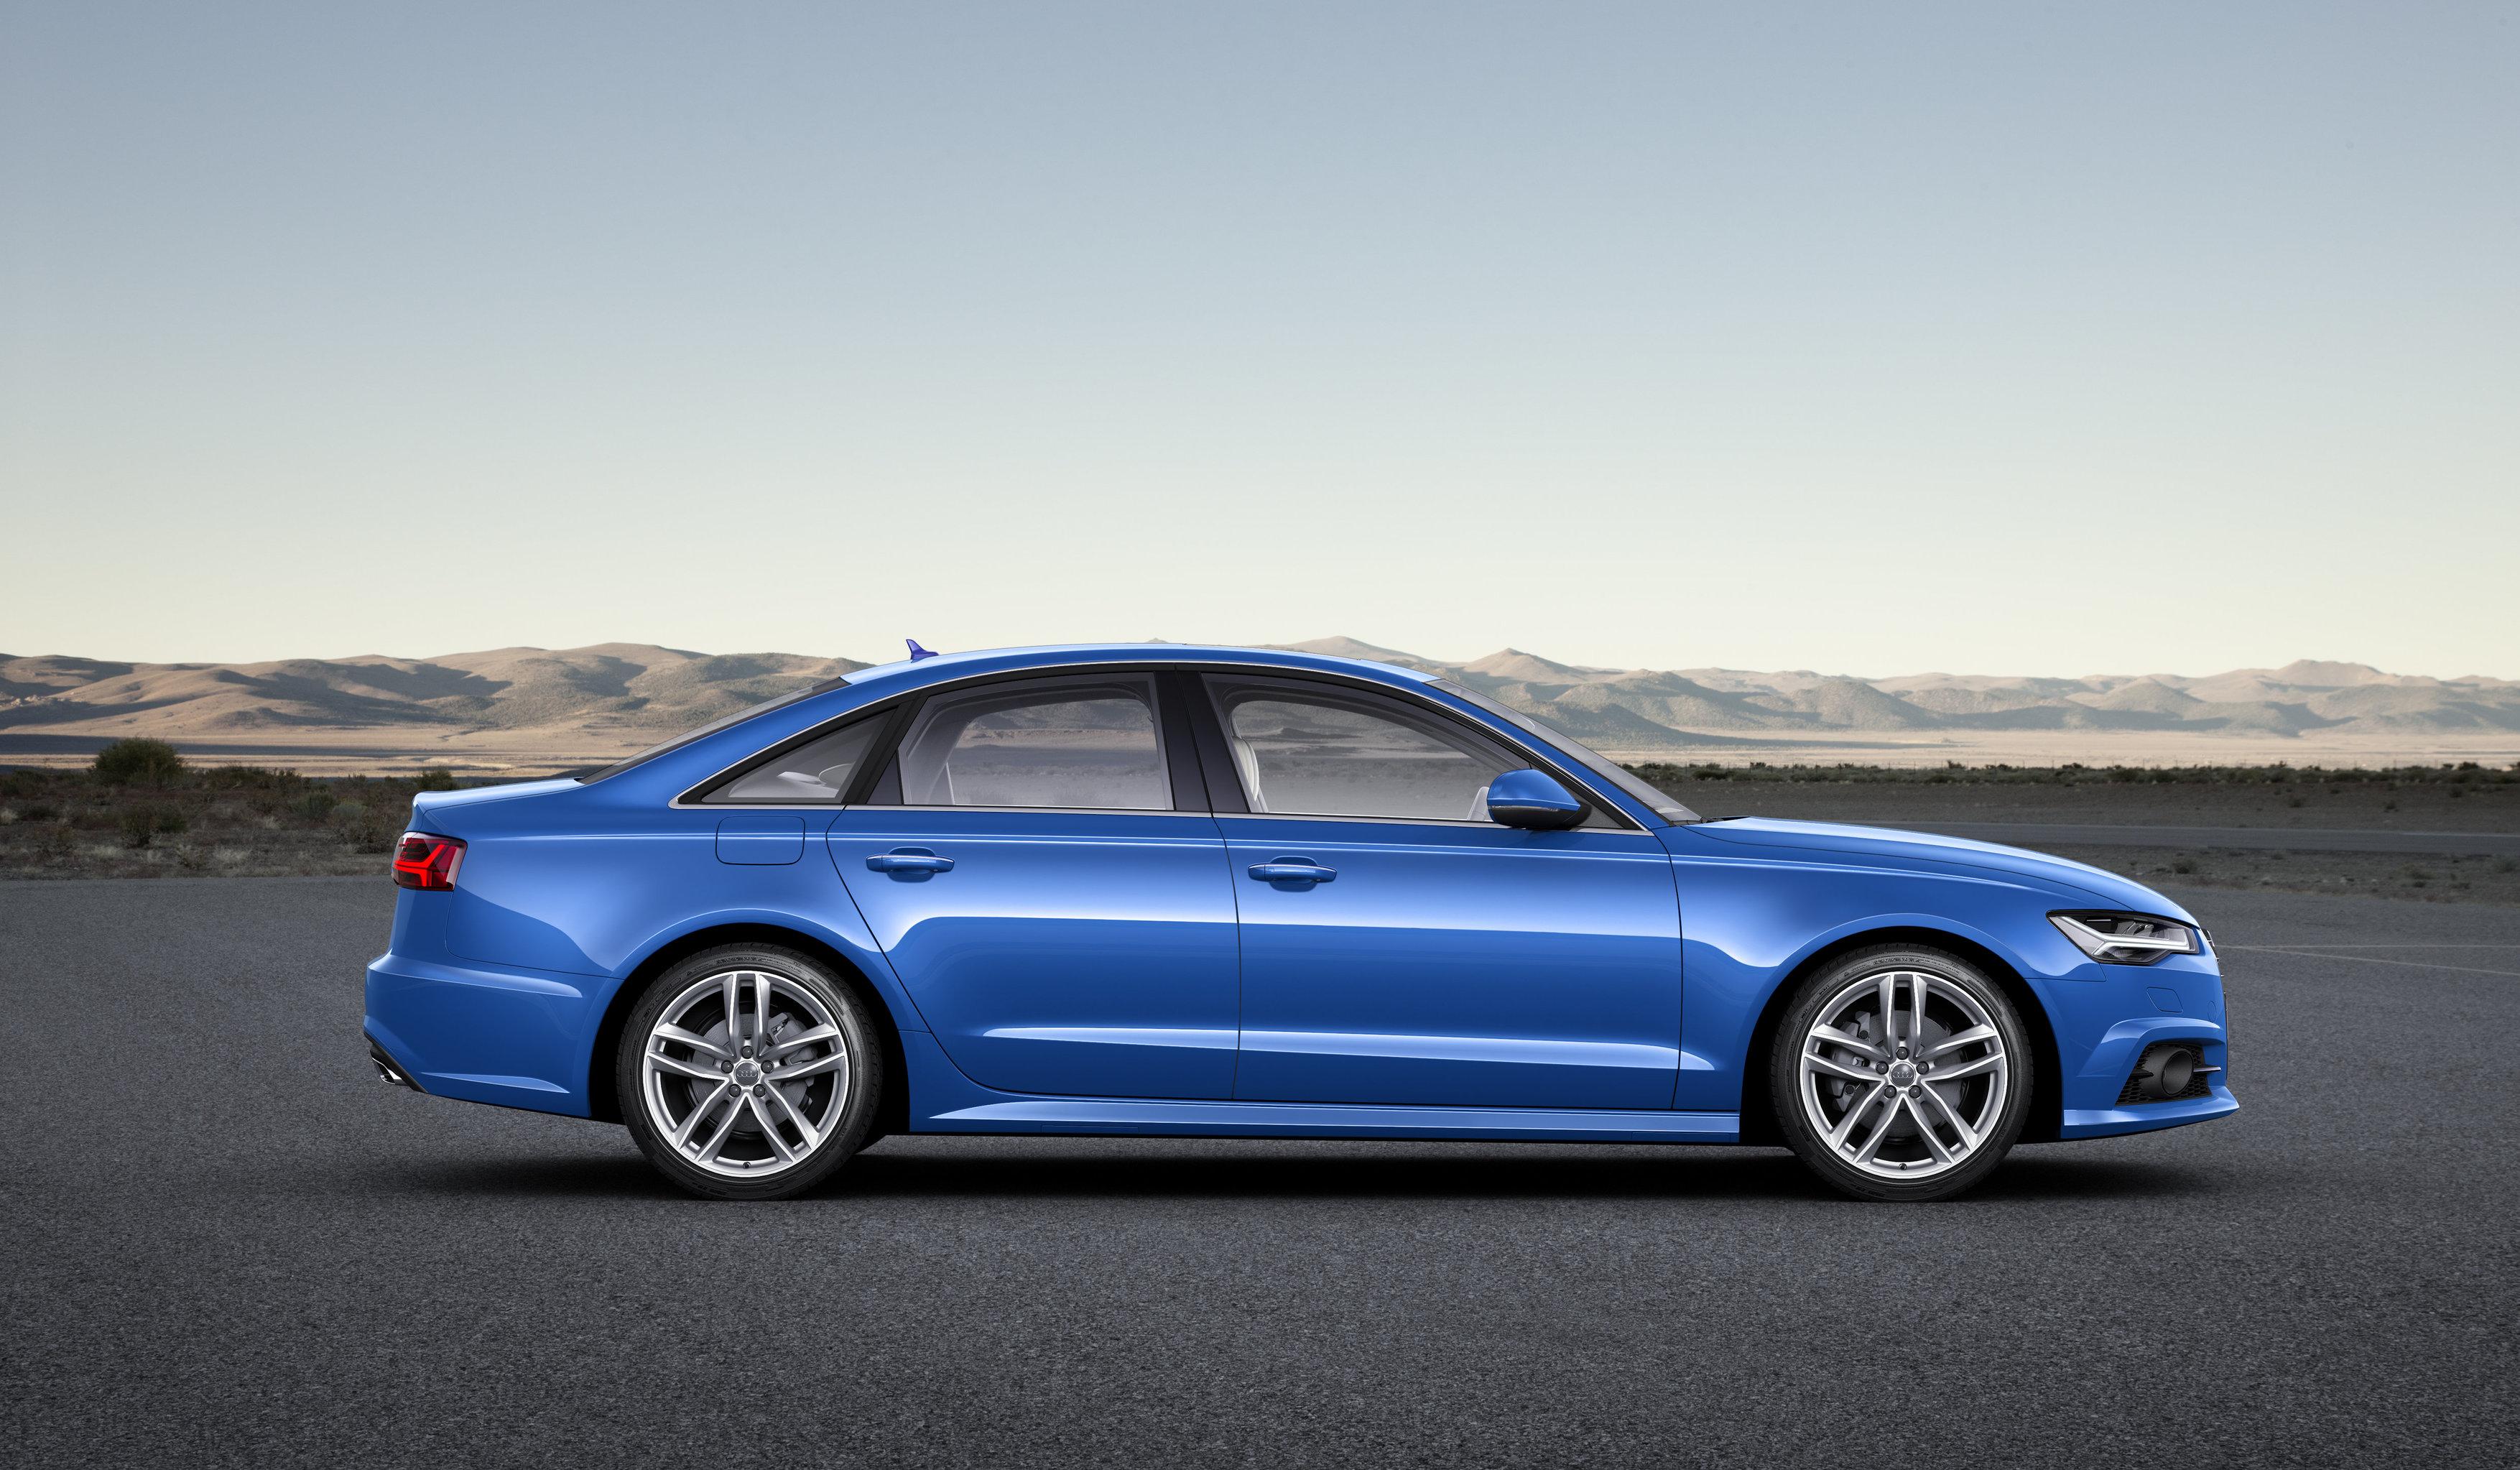 filed under: 2017 Audi A6 2017 Audi A7 Audi audi usa